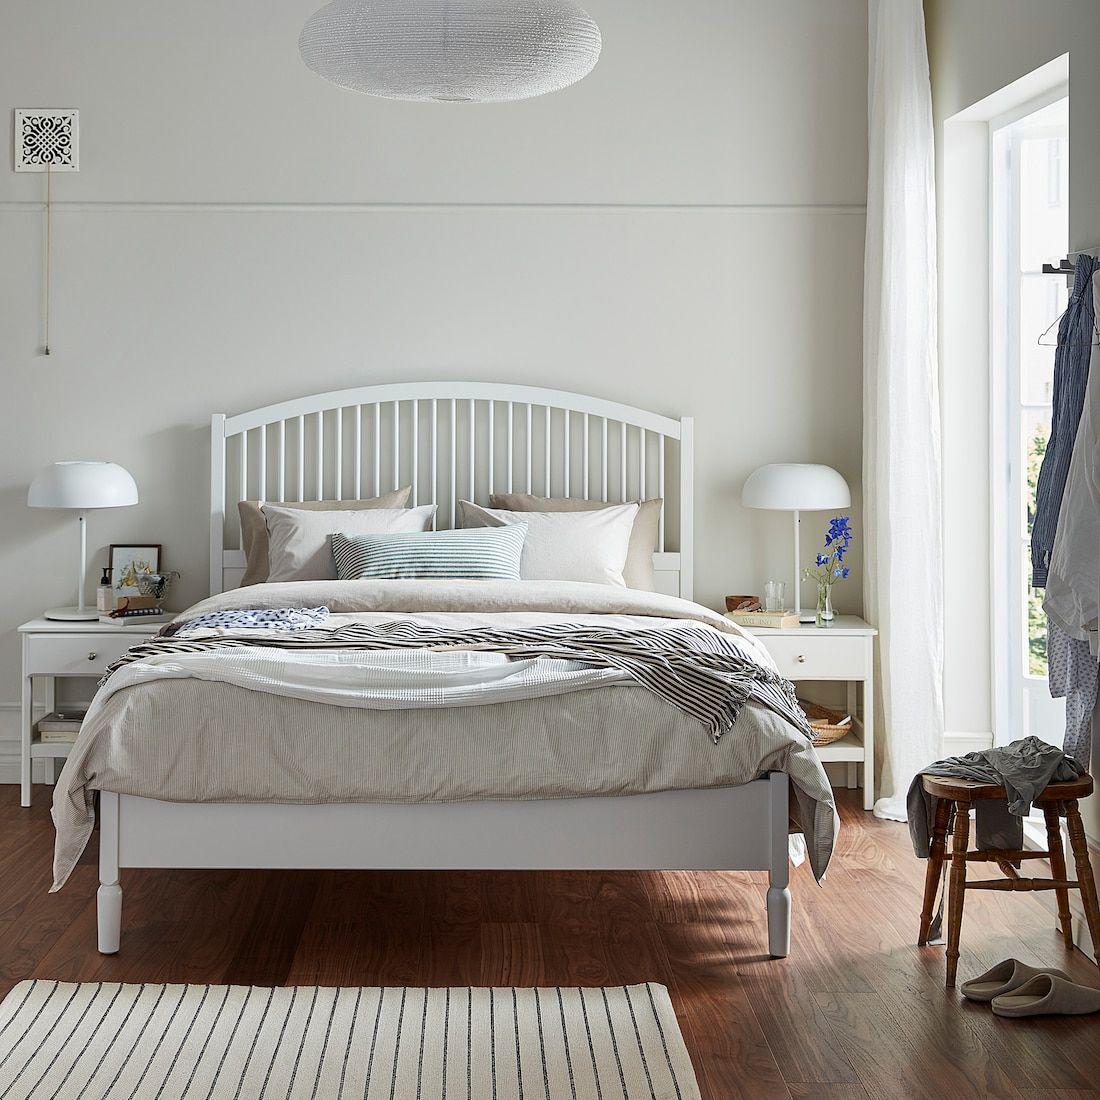 Tyssedal Bedframe Wit 160x200 Cm Ikea White Bed Frame Bed Frame Ikea Tyssedal